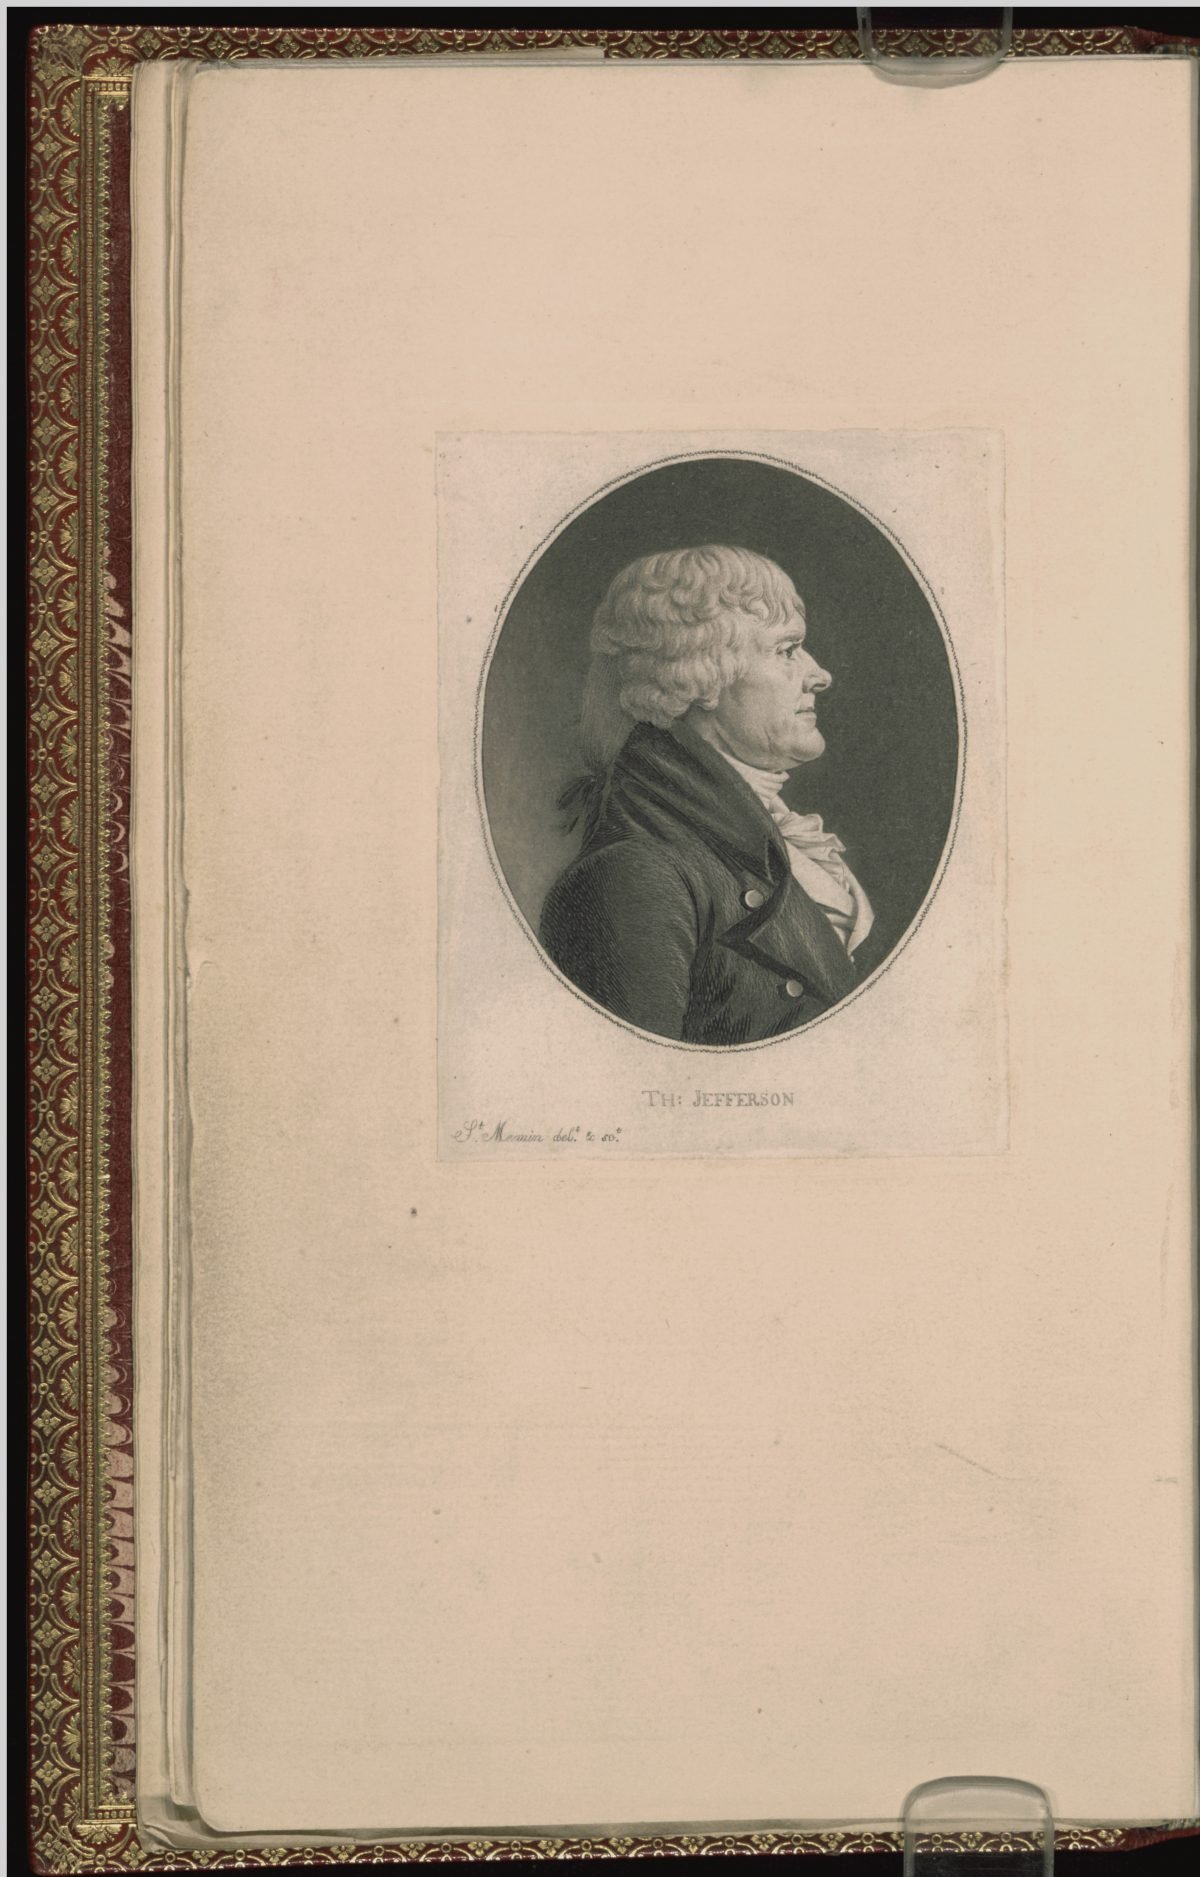 Engraving of Thomas Jefferson